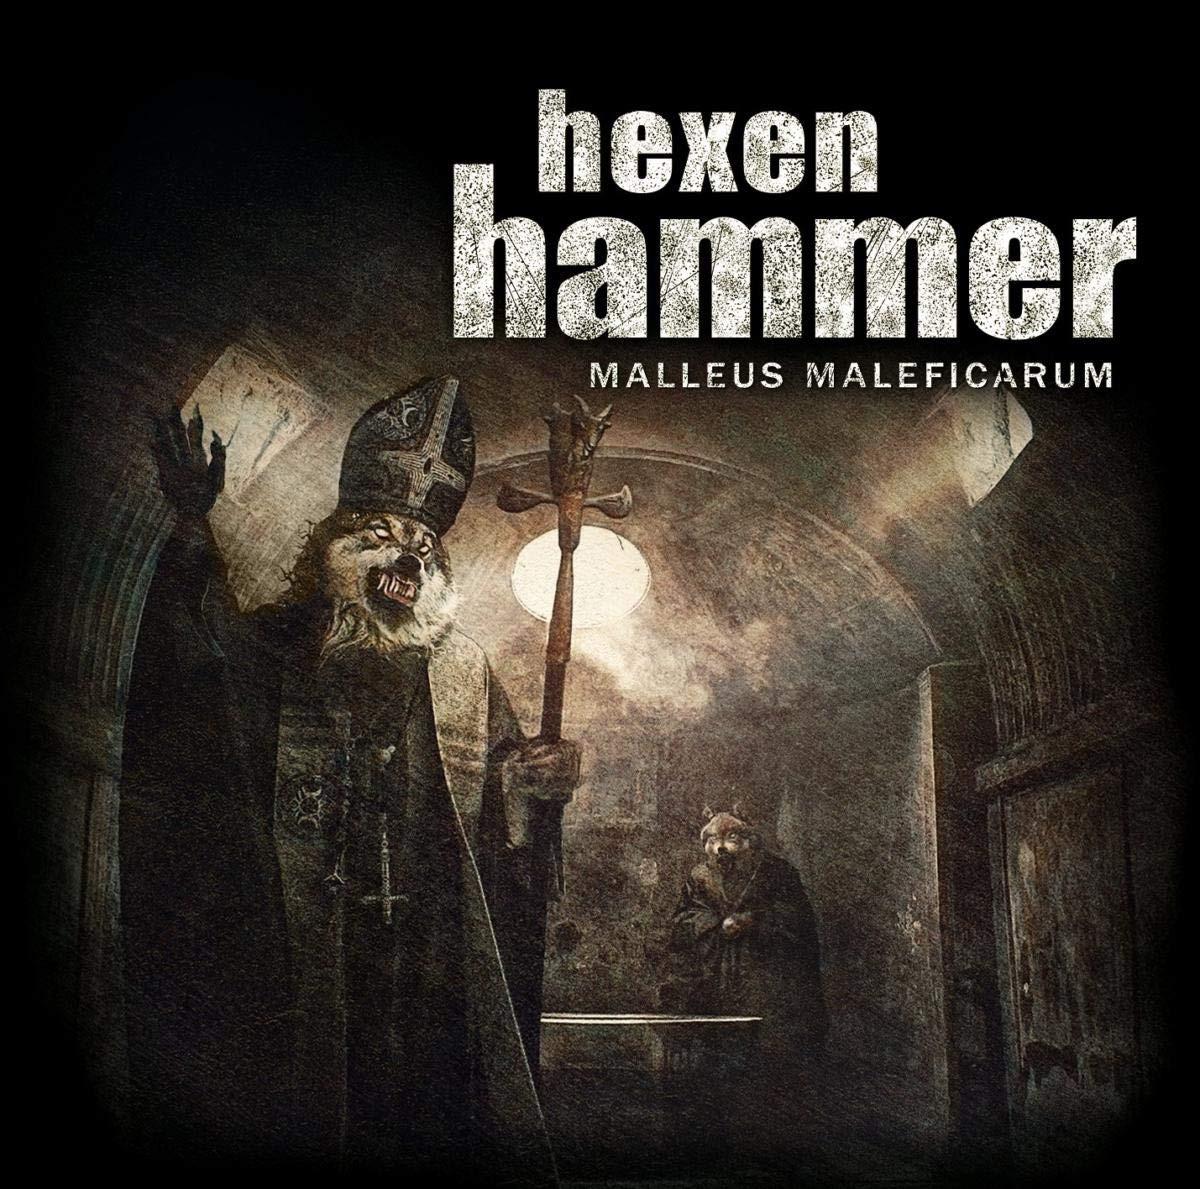 Dorian Hunter - Hexenhammer 2:  Alles Leid währt Ewigkeit